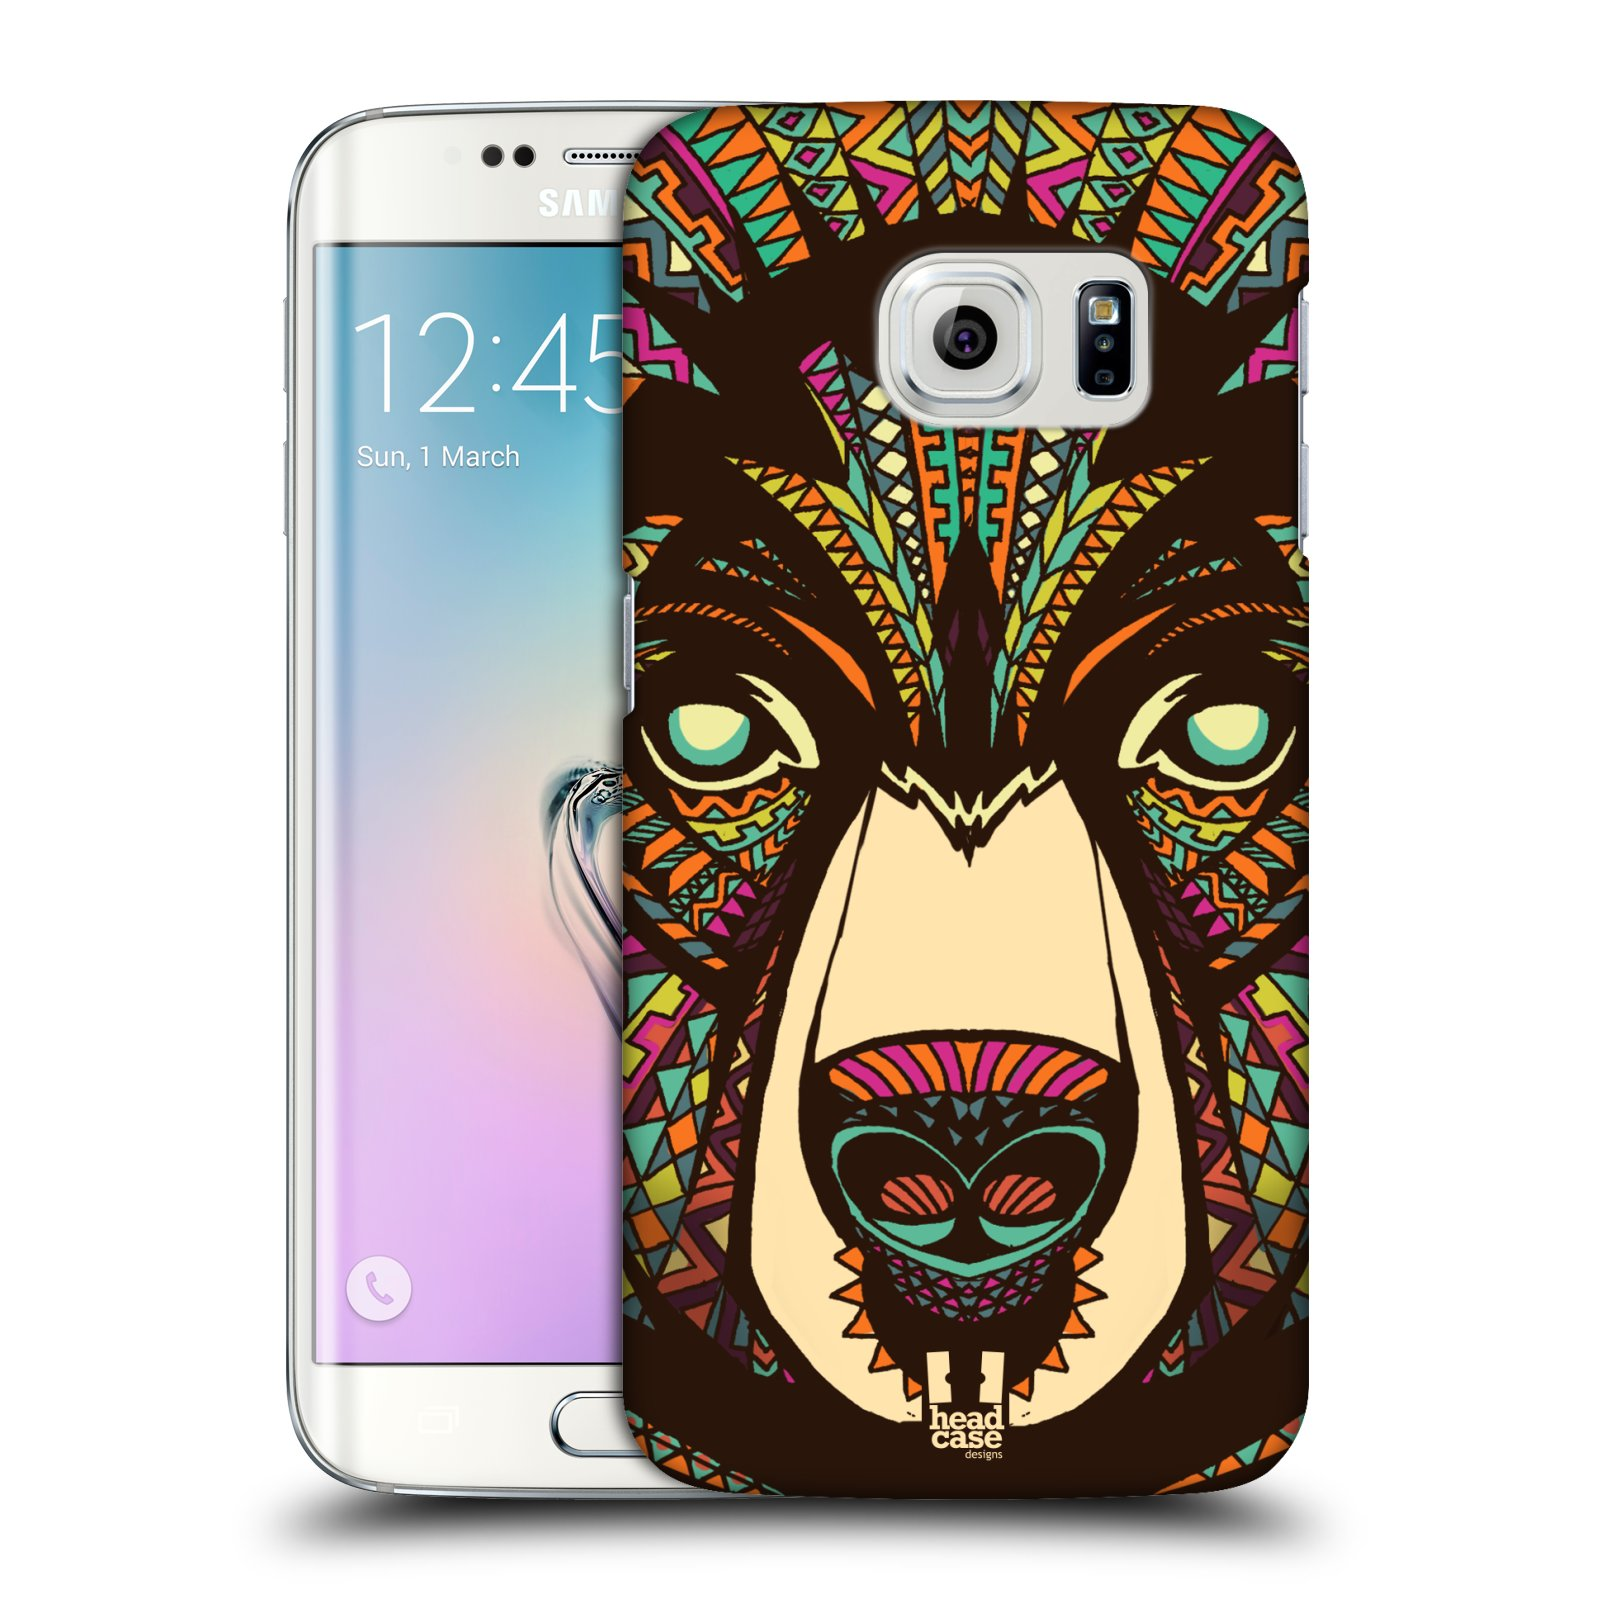 Plastové pouzdro na mobil Samsung Galaxy S6 Edge HEAD CASE AZTEC MEDVĚD (Kryt či obal na mobilní telefon Samsung Galaxy S6 Edge SM-G925F)